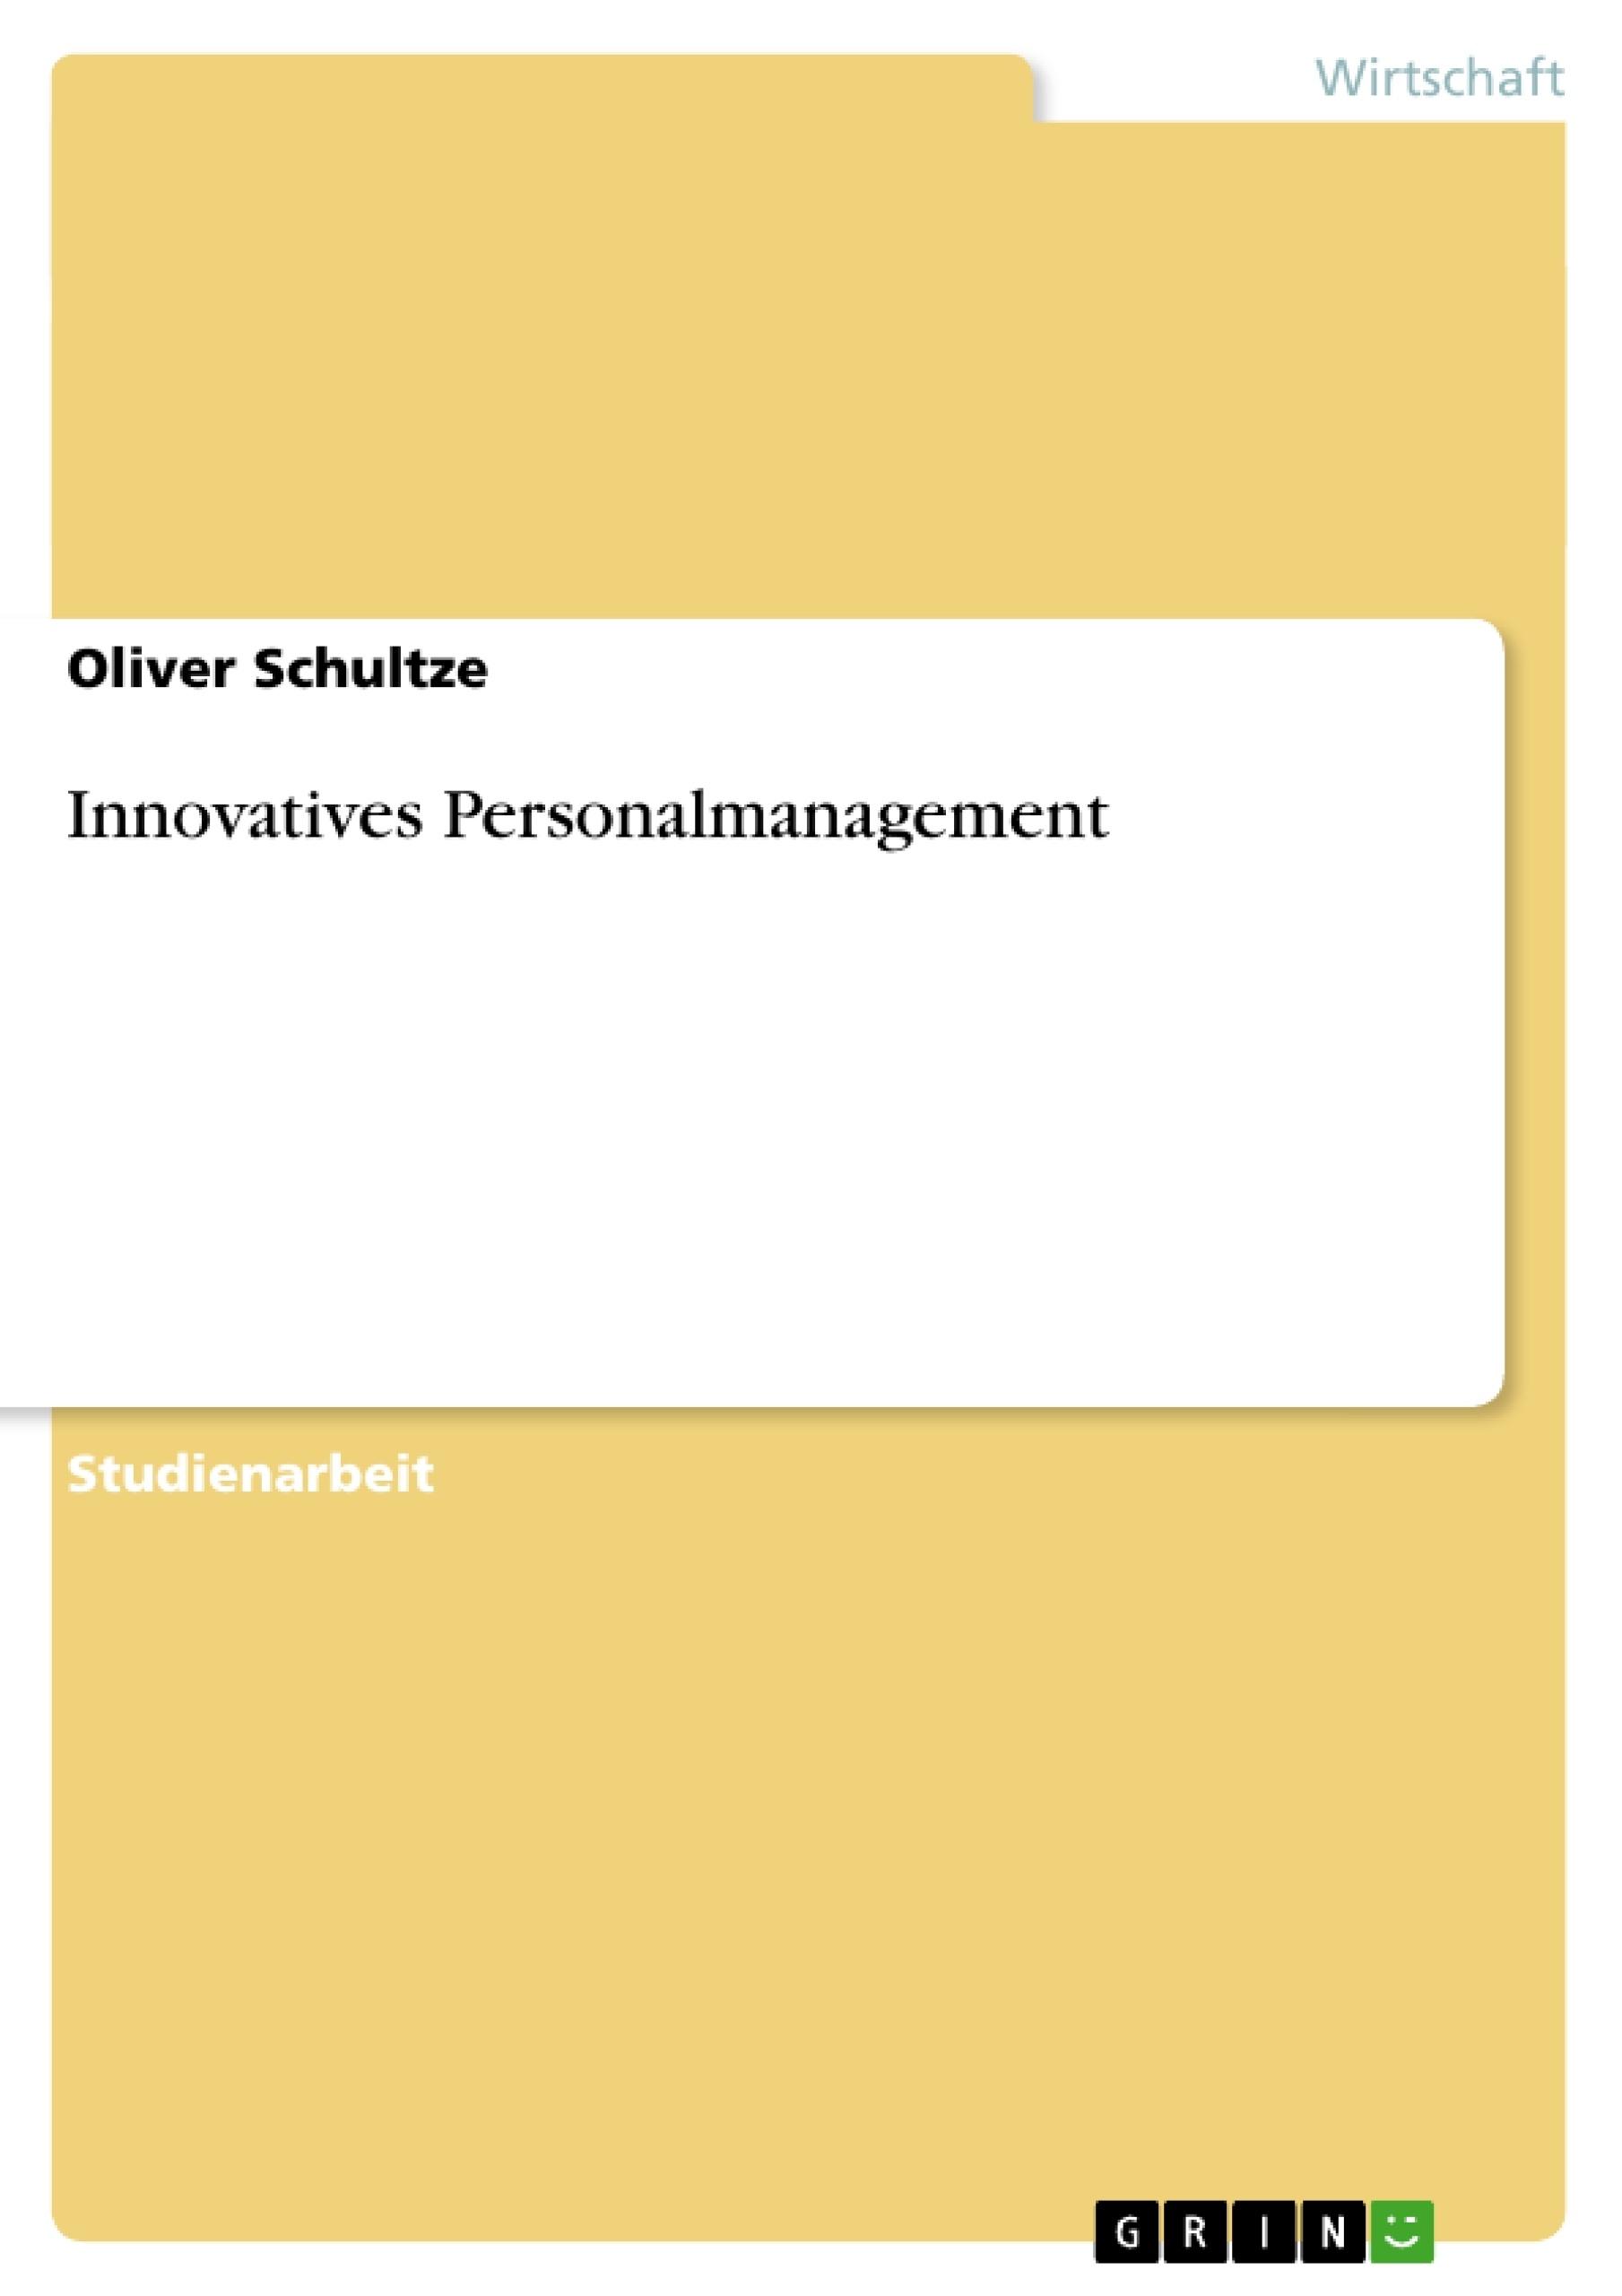 Titel: Innovatives Personalmanagement